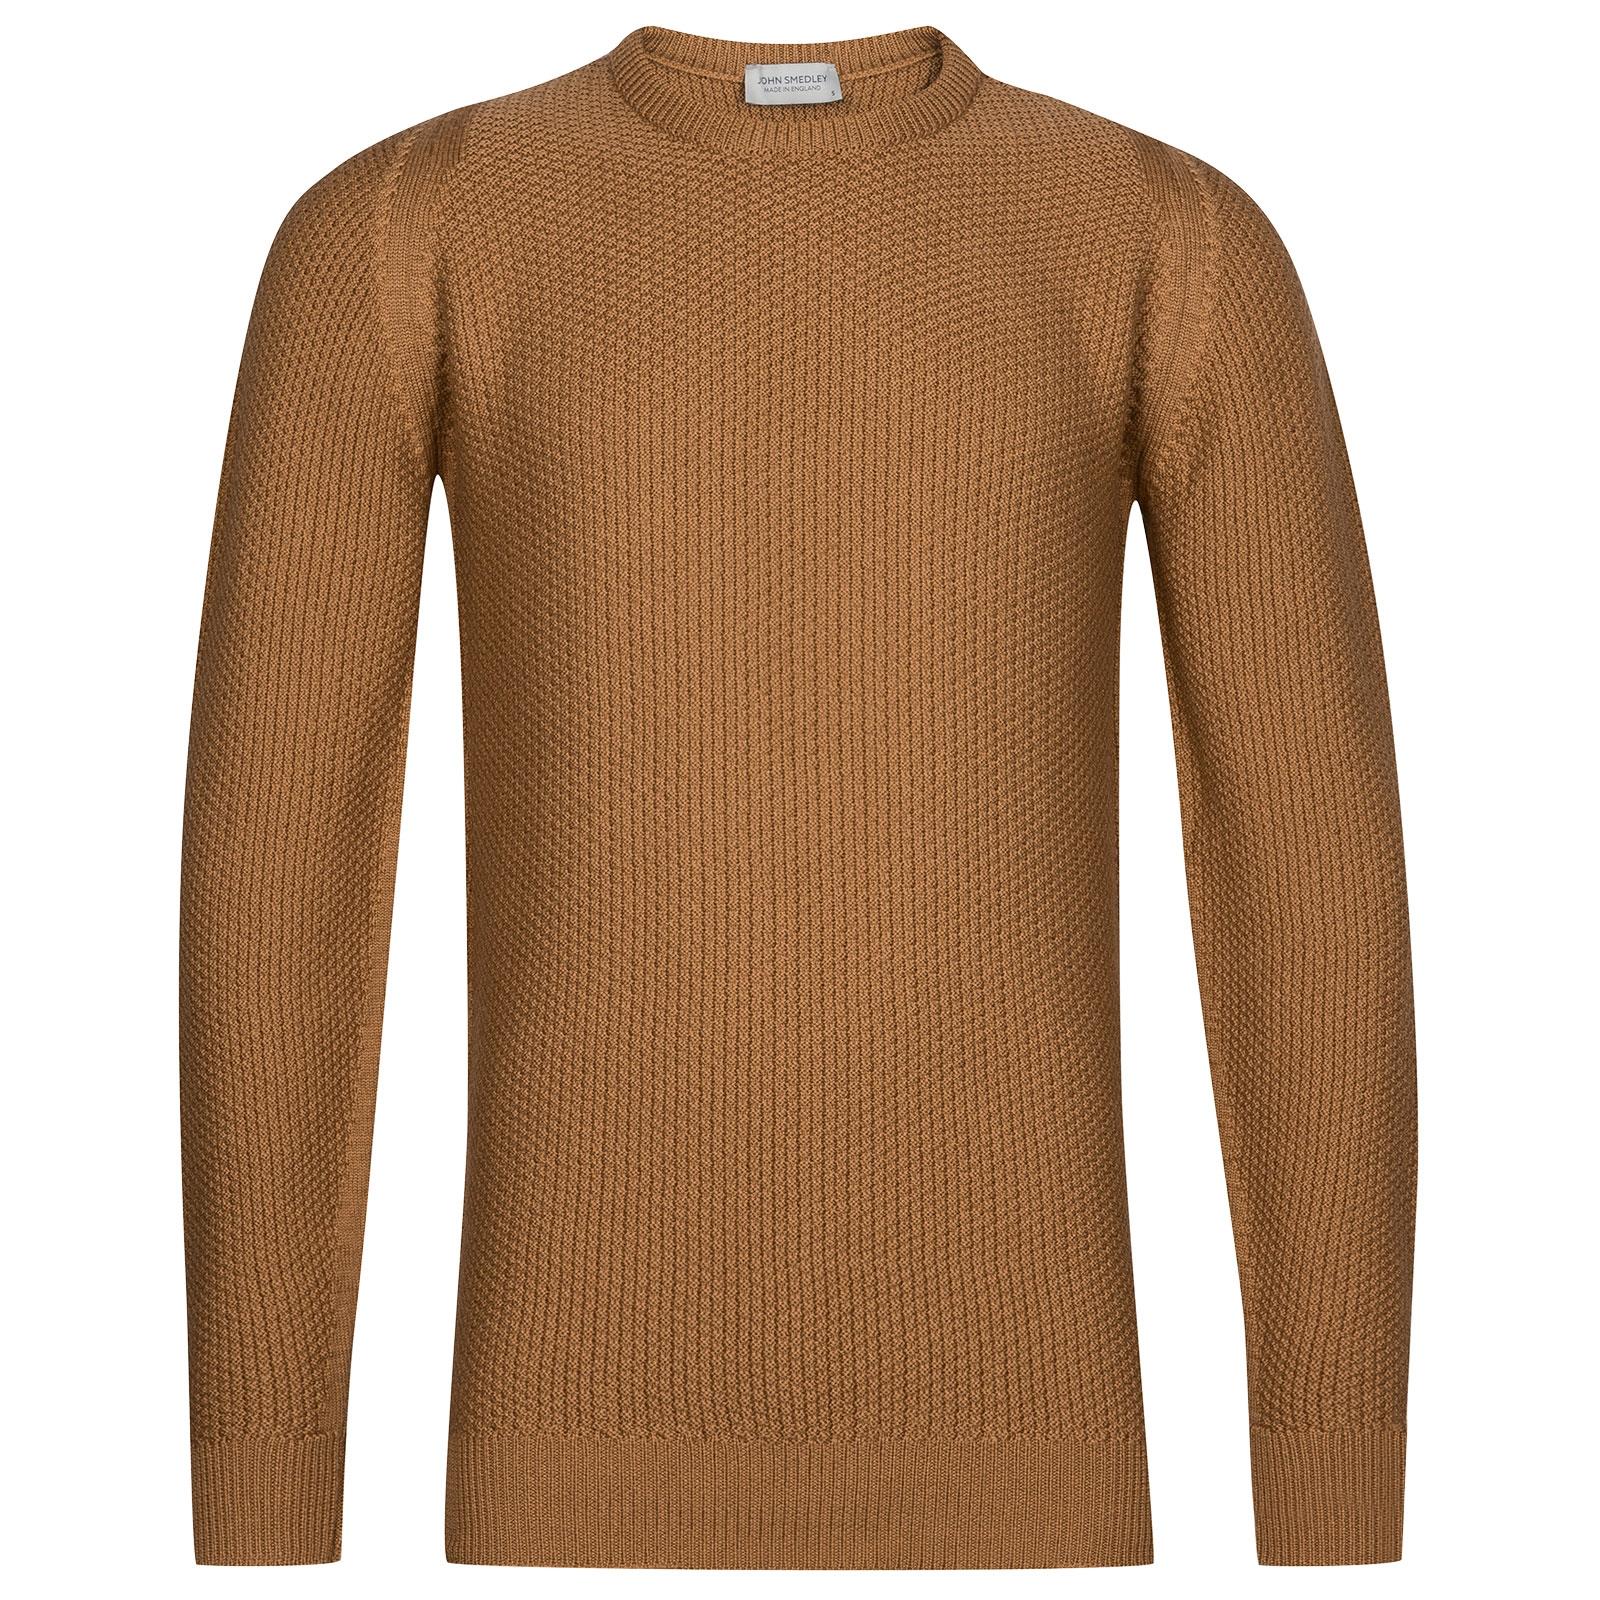 John Smedley 8singular Merino Wool Pullover in Camel-XS